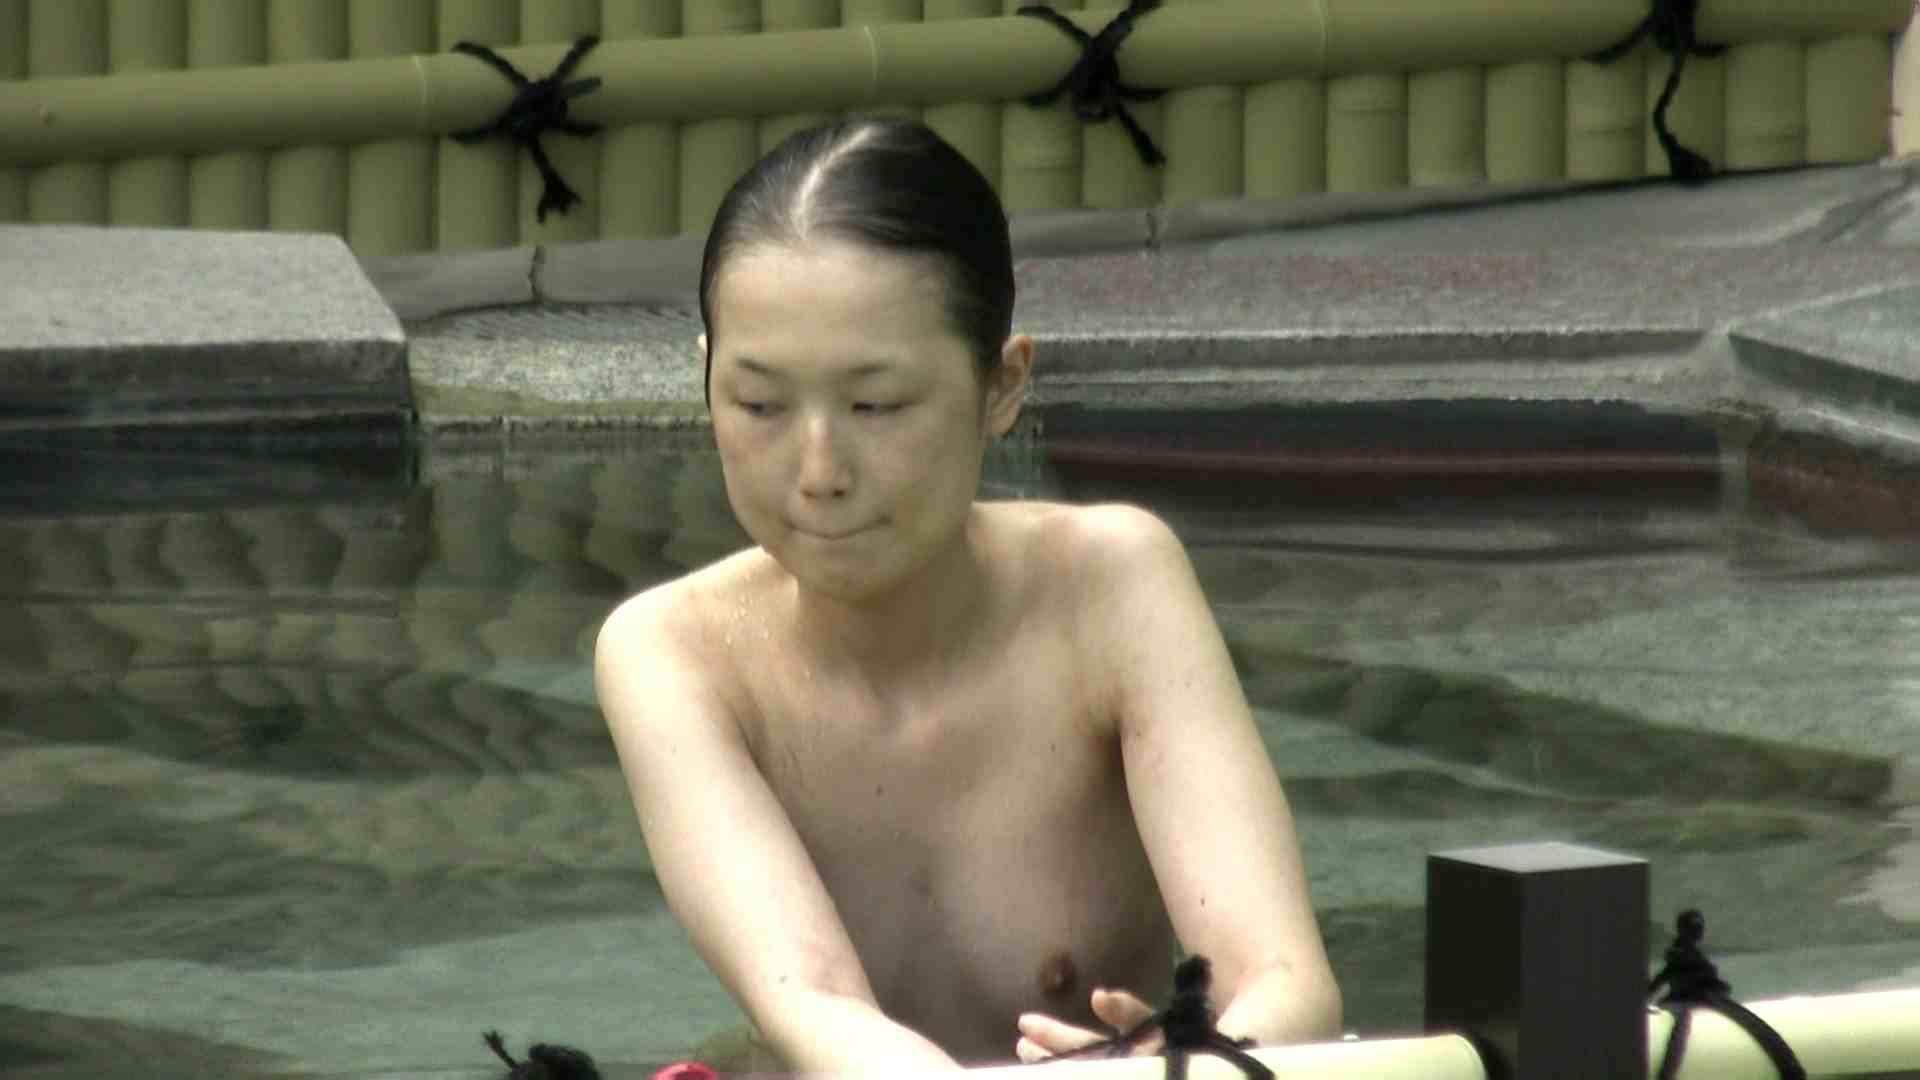 Aquaな露天風呂Vol.661 0  23連発 4